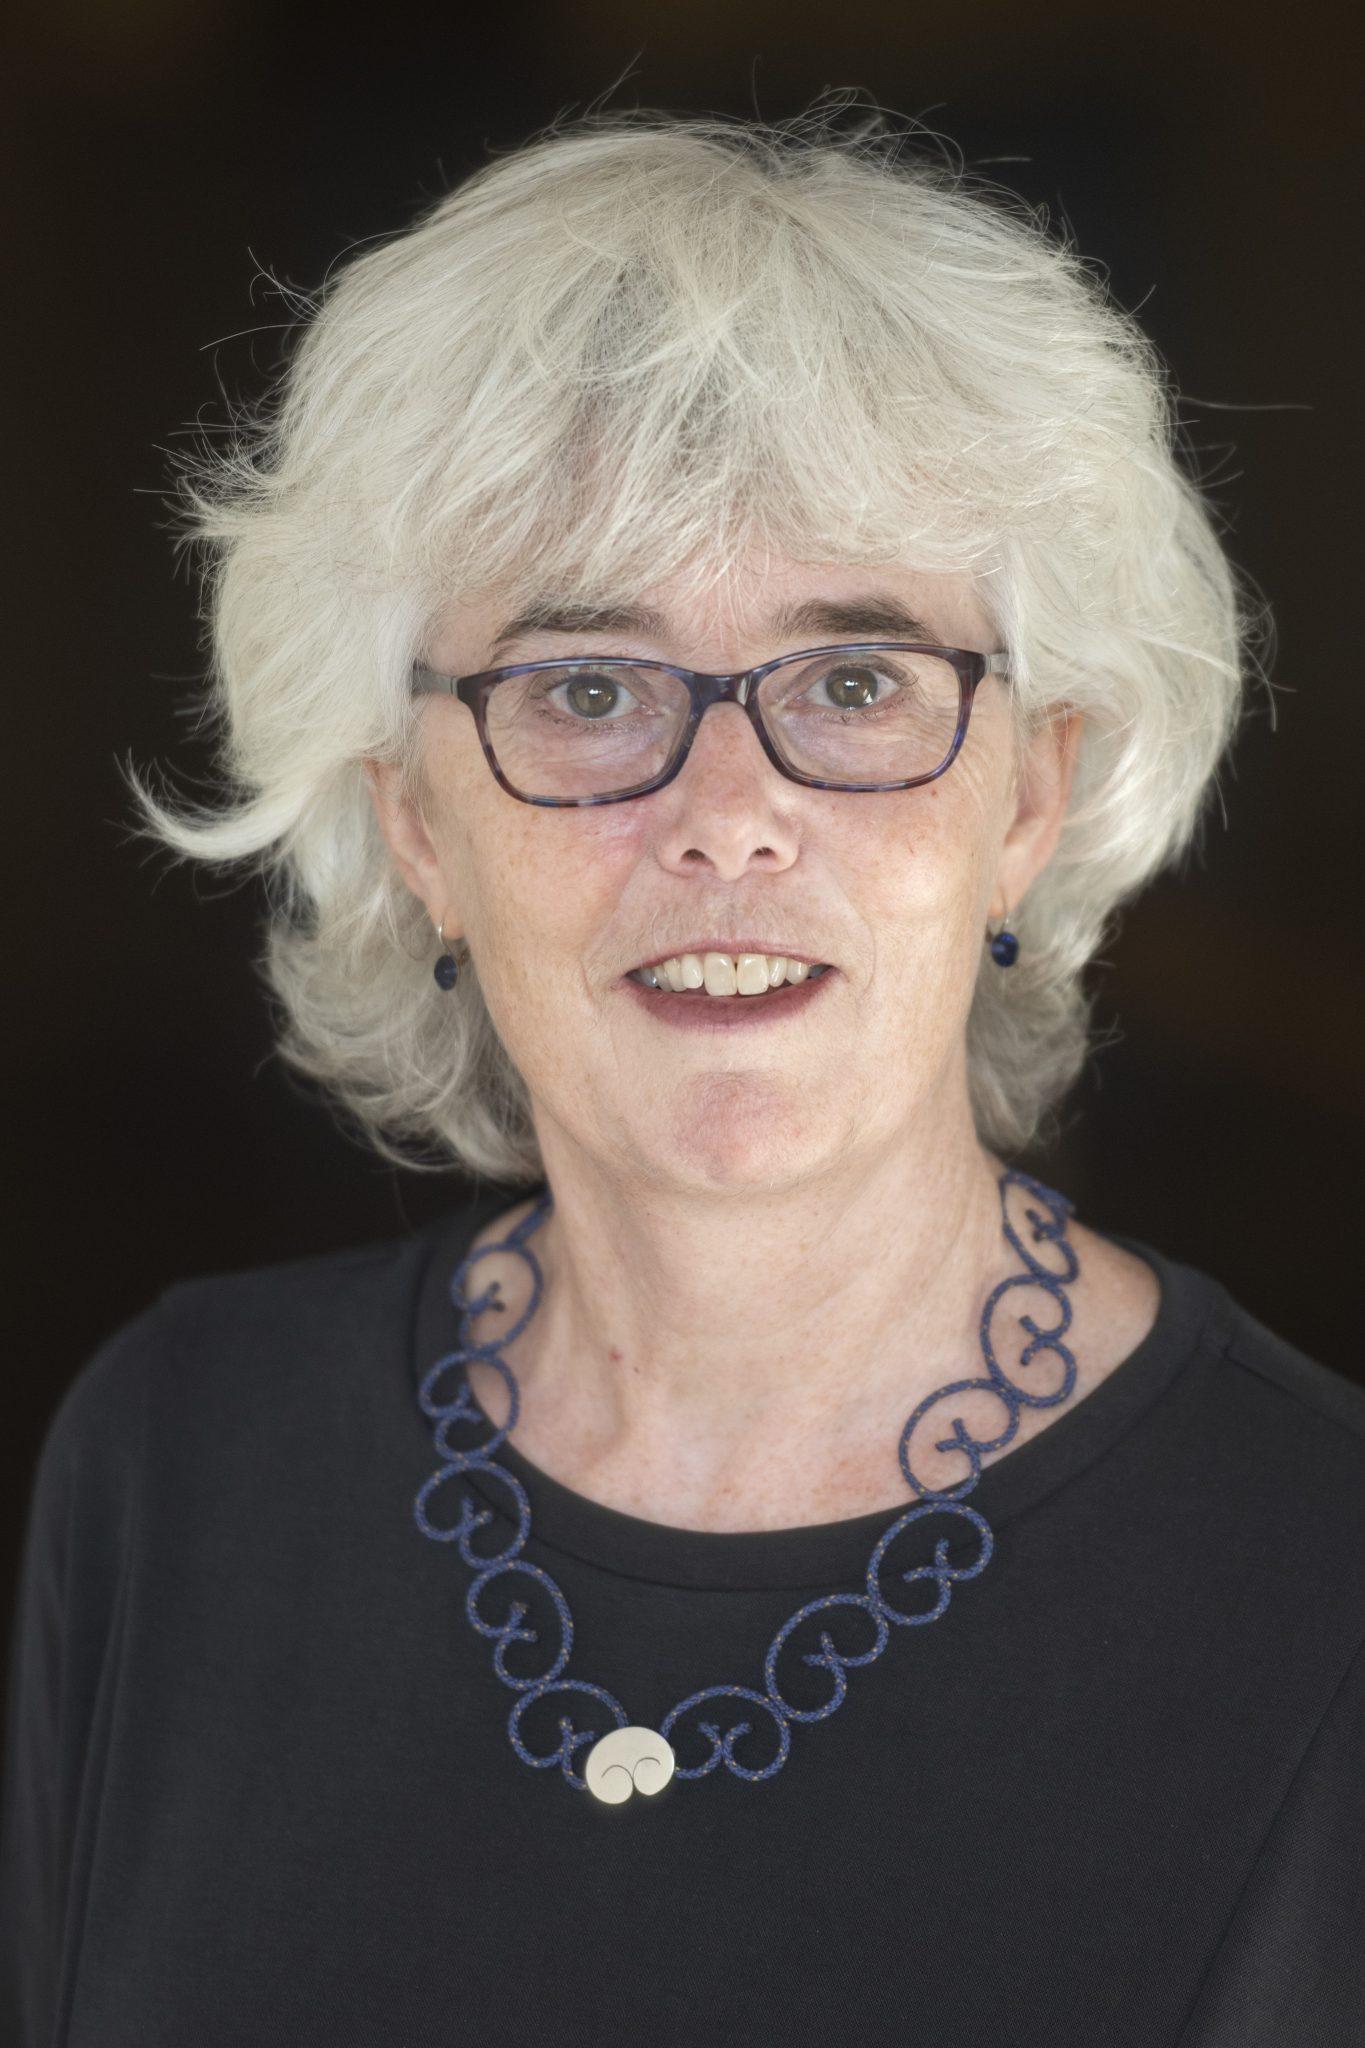 Mevrouw drs. J.J. (Jikke) van der Spek